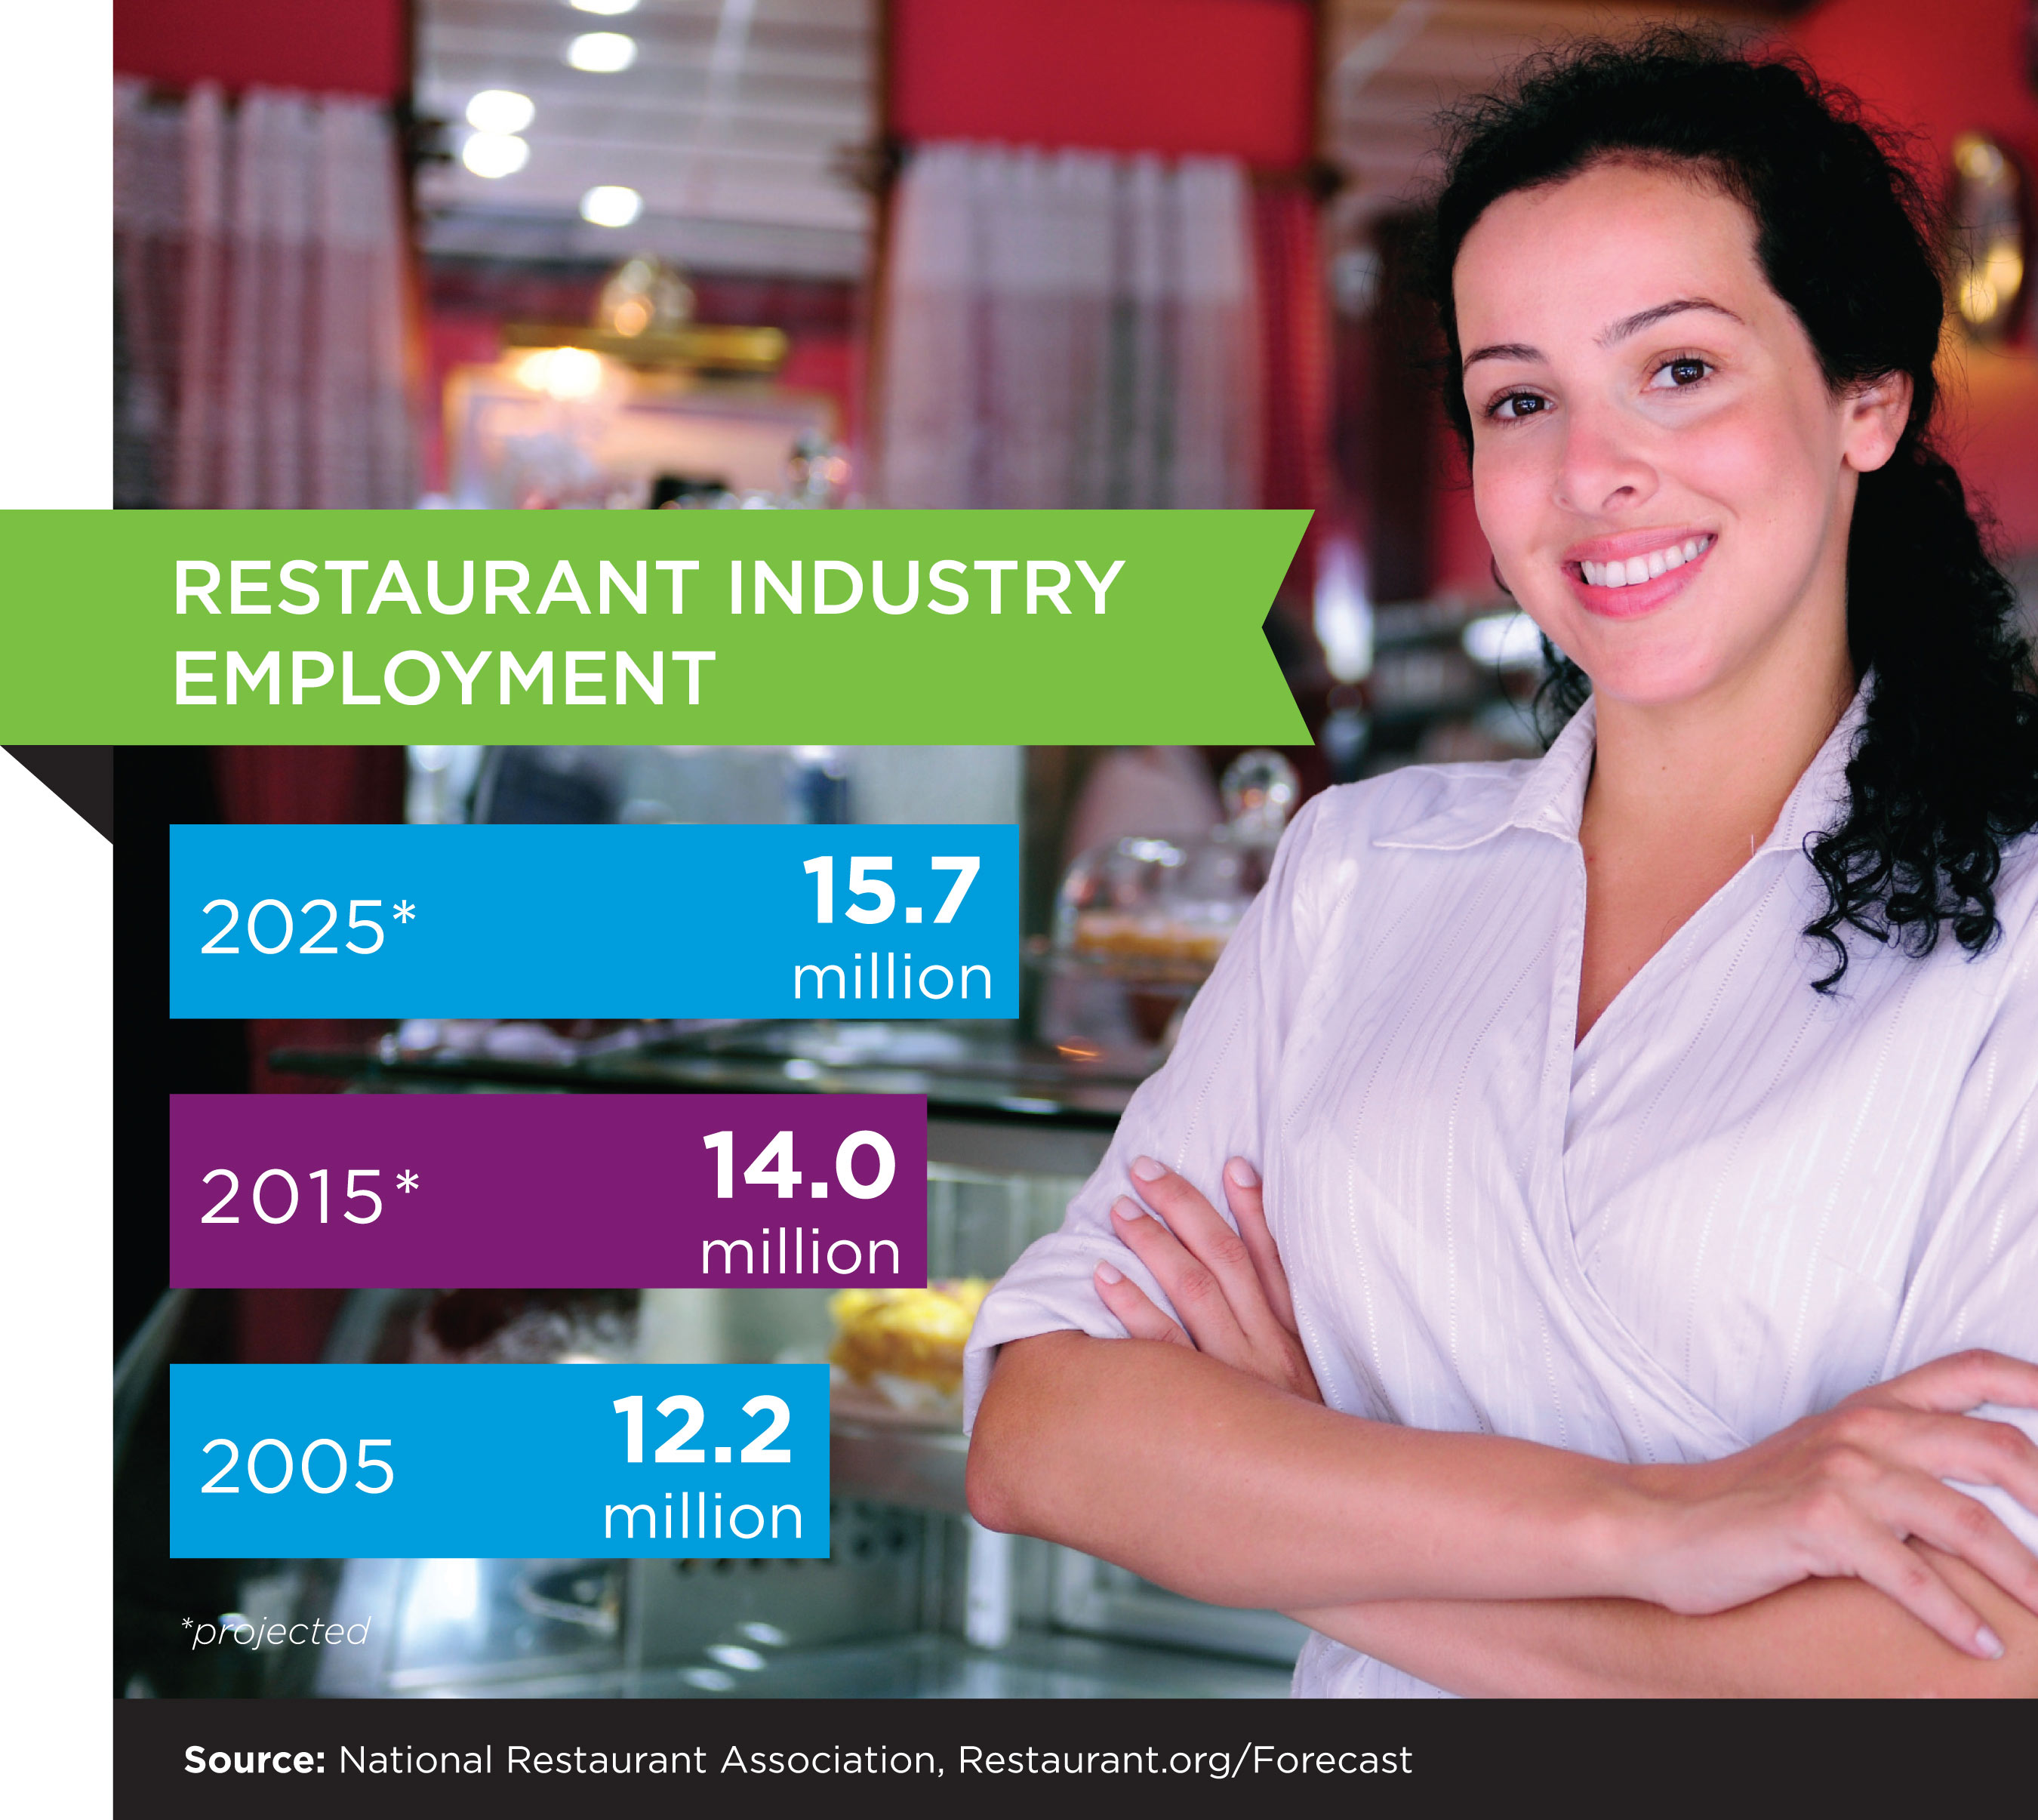 http://www.multivu.com/players/English/7077454-nra-restaurant-industry-forecast/gallery/image/fe2d95b1-3d38-4c63-9f18-3b565ada02ee.HR.jpg